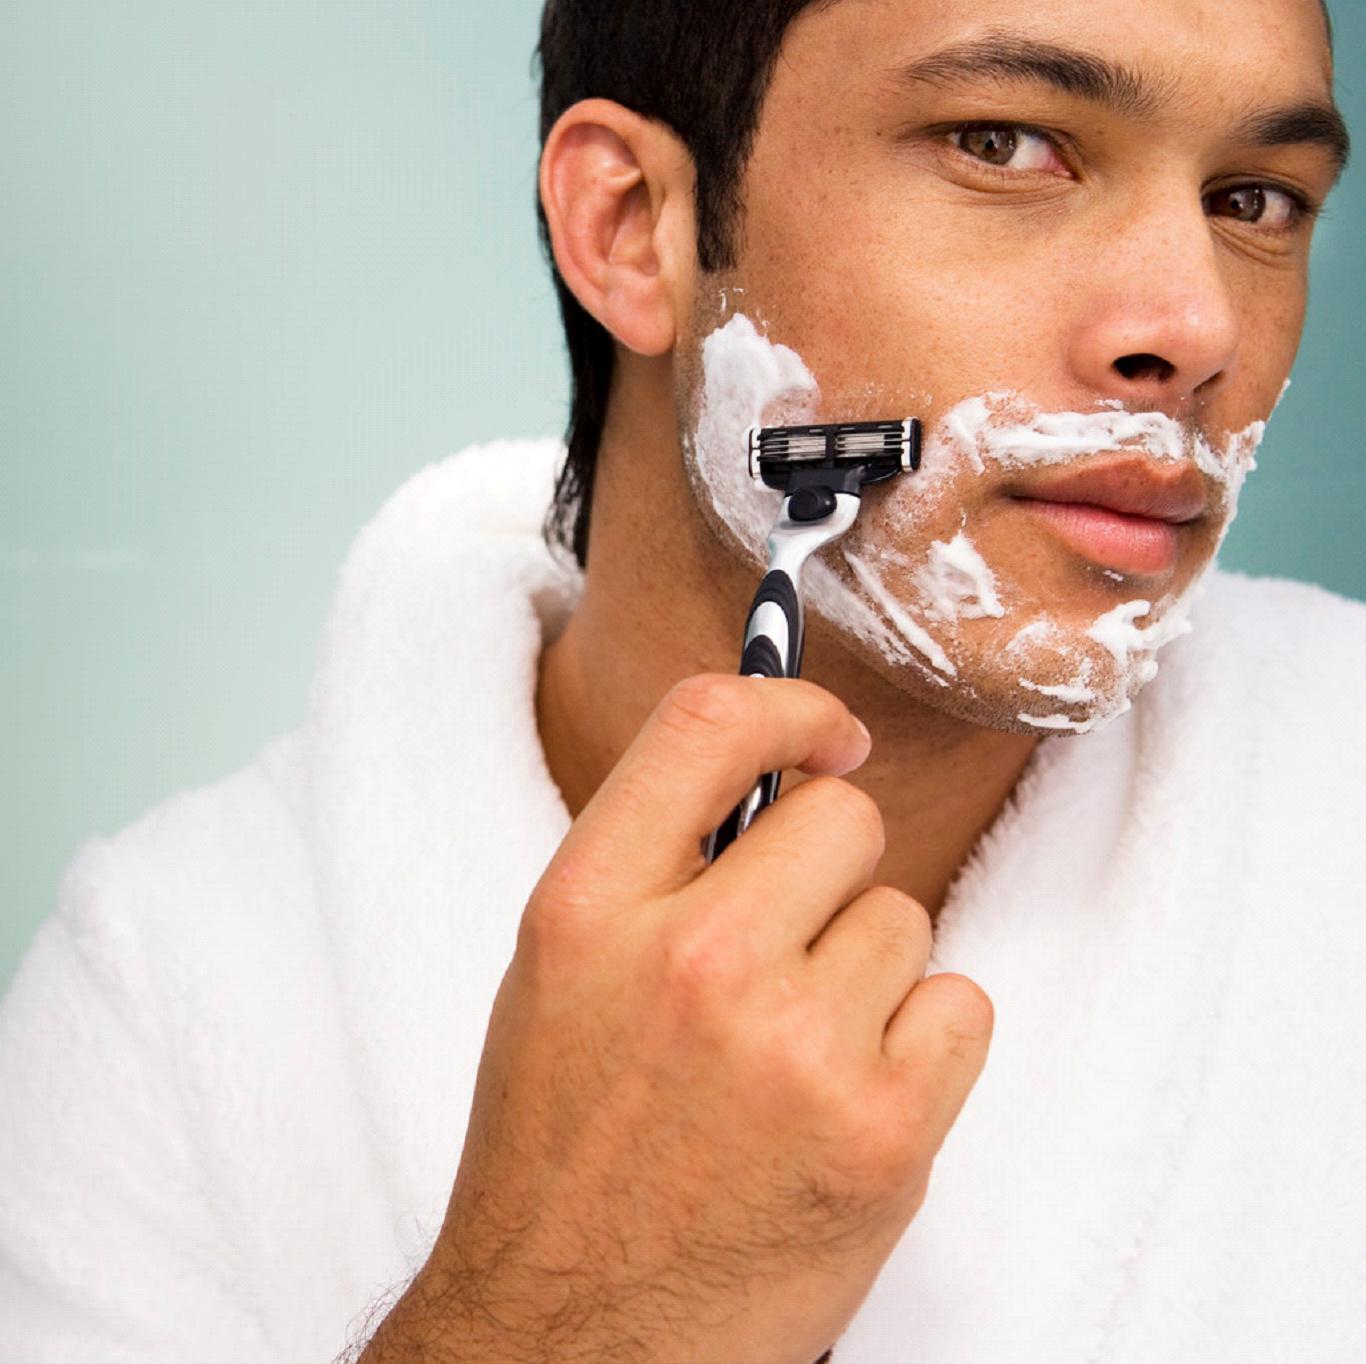 Mens Face Wax : Depilatory waxing expert?s blog: Is waxing better than shaving?